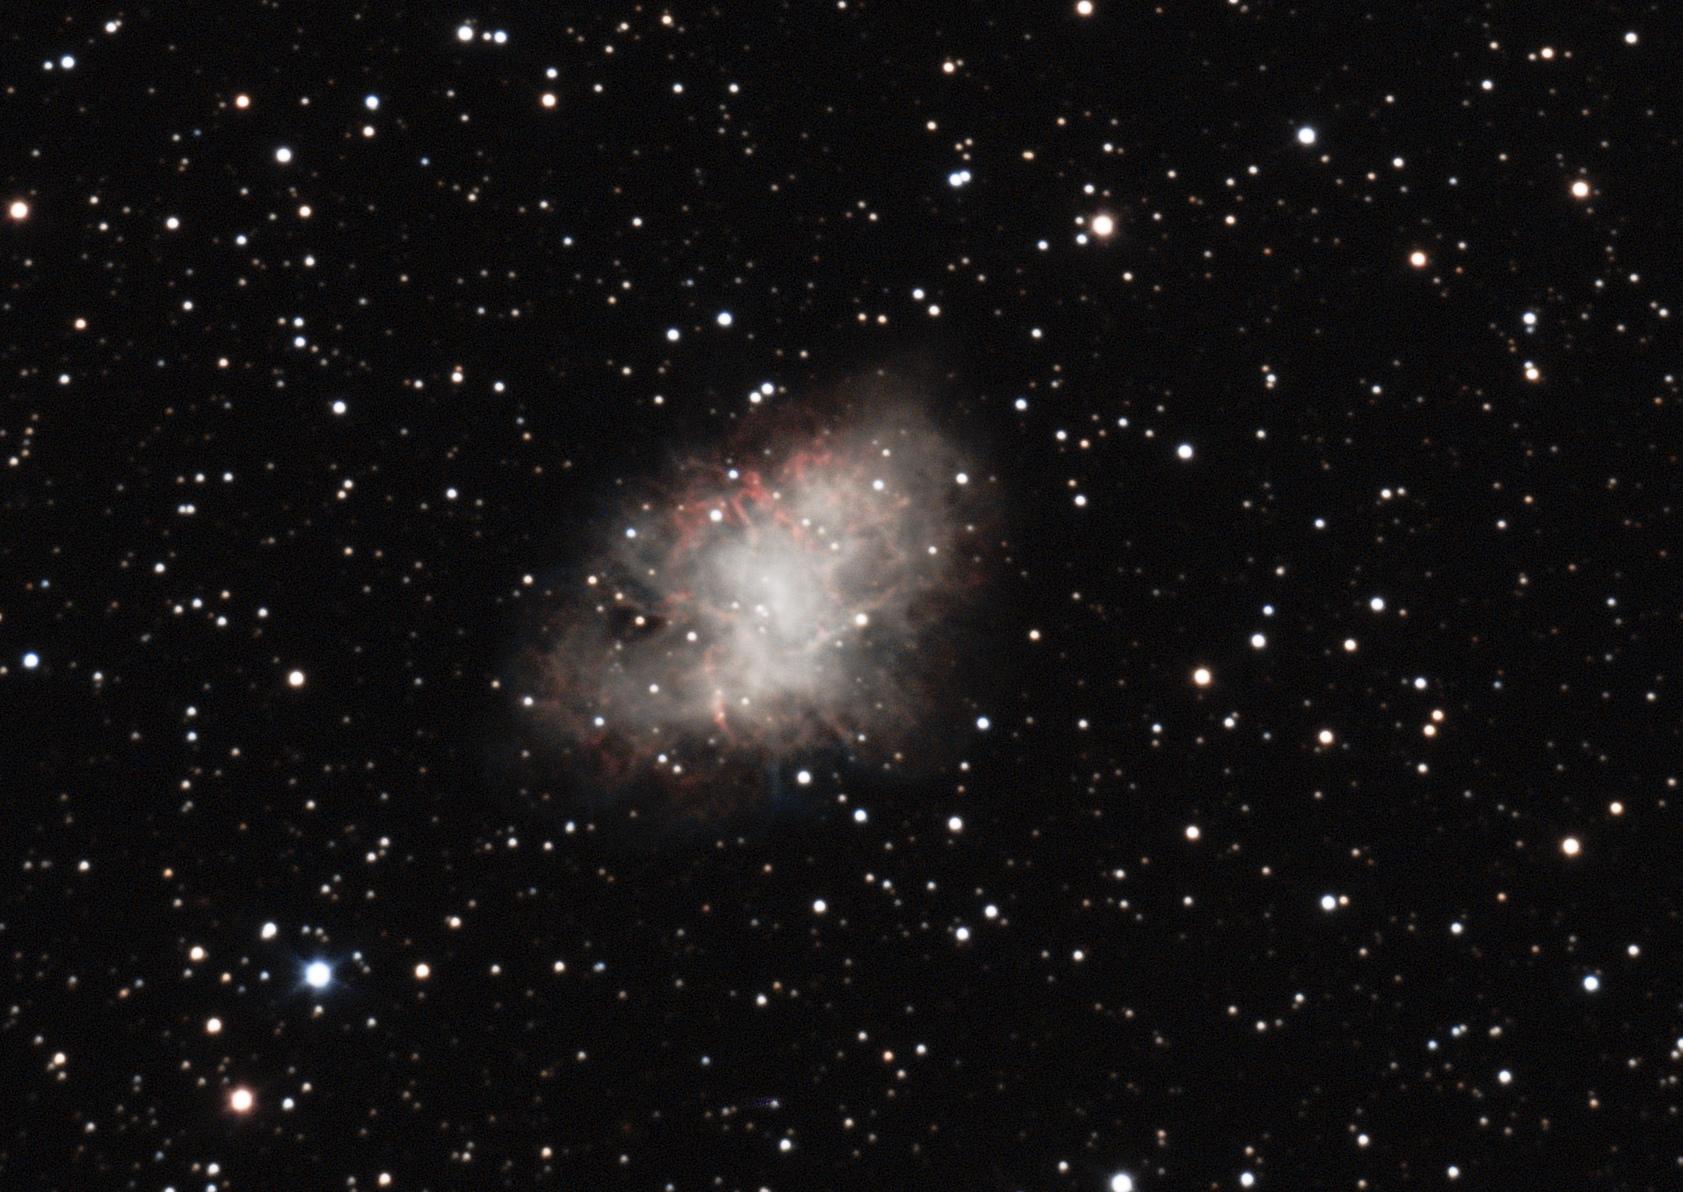 M1_65x1mn_G200_-15°.jpg